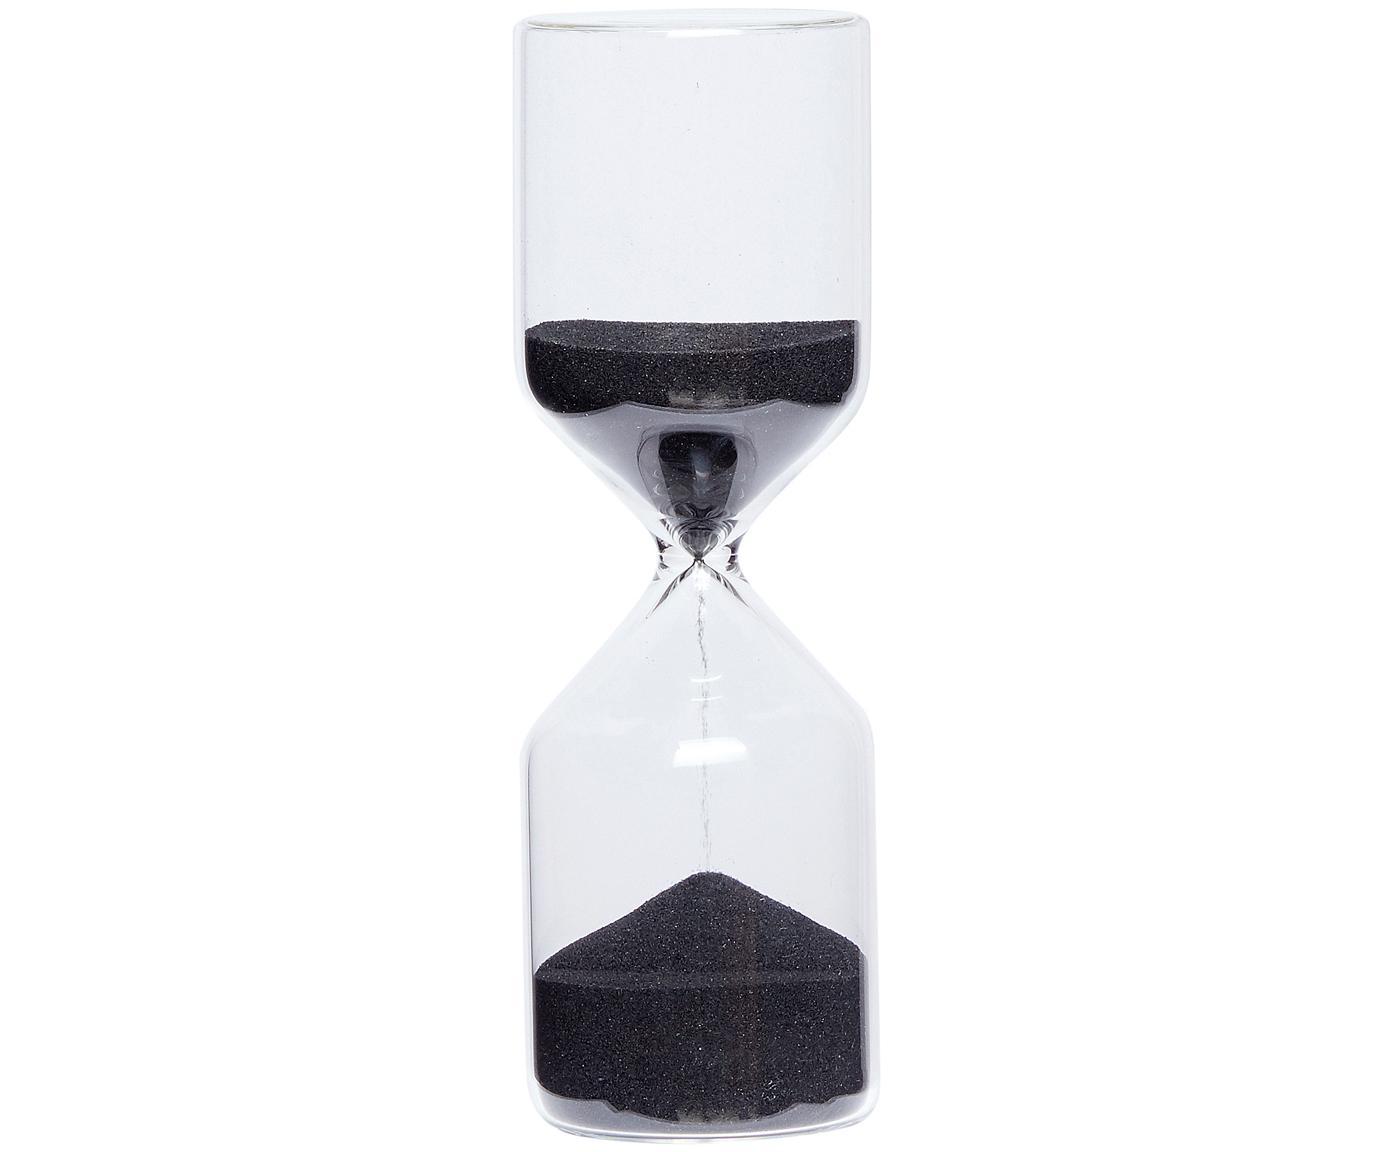 Clessidra Fugit, Vetro, Clessidra: trasparente Sabbia: nero, Ø 6 x A 18 cm